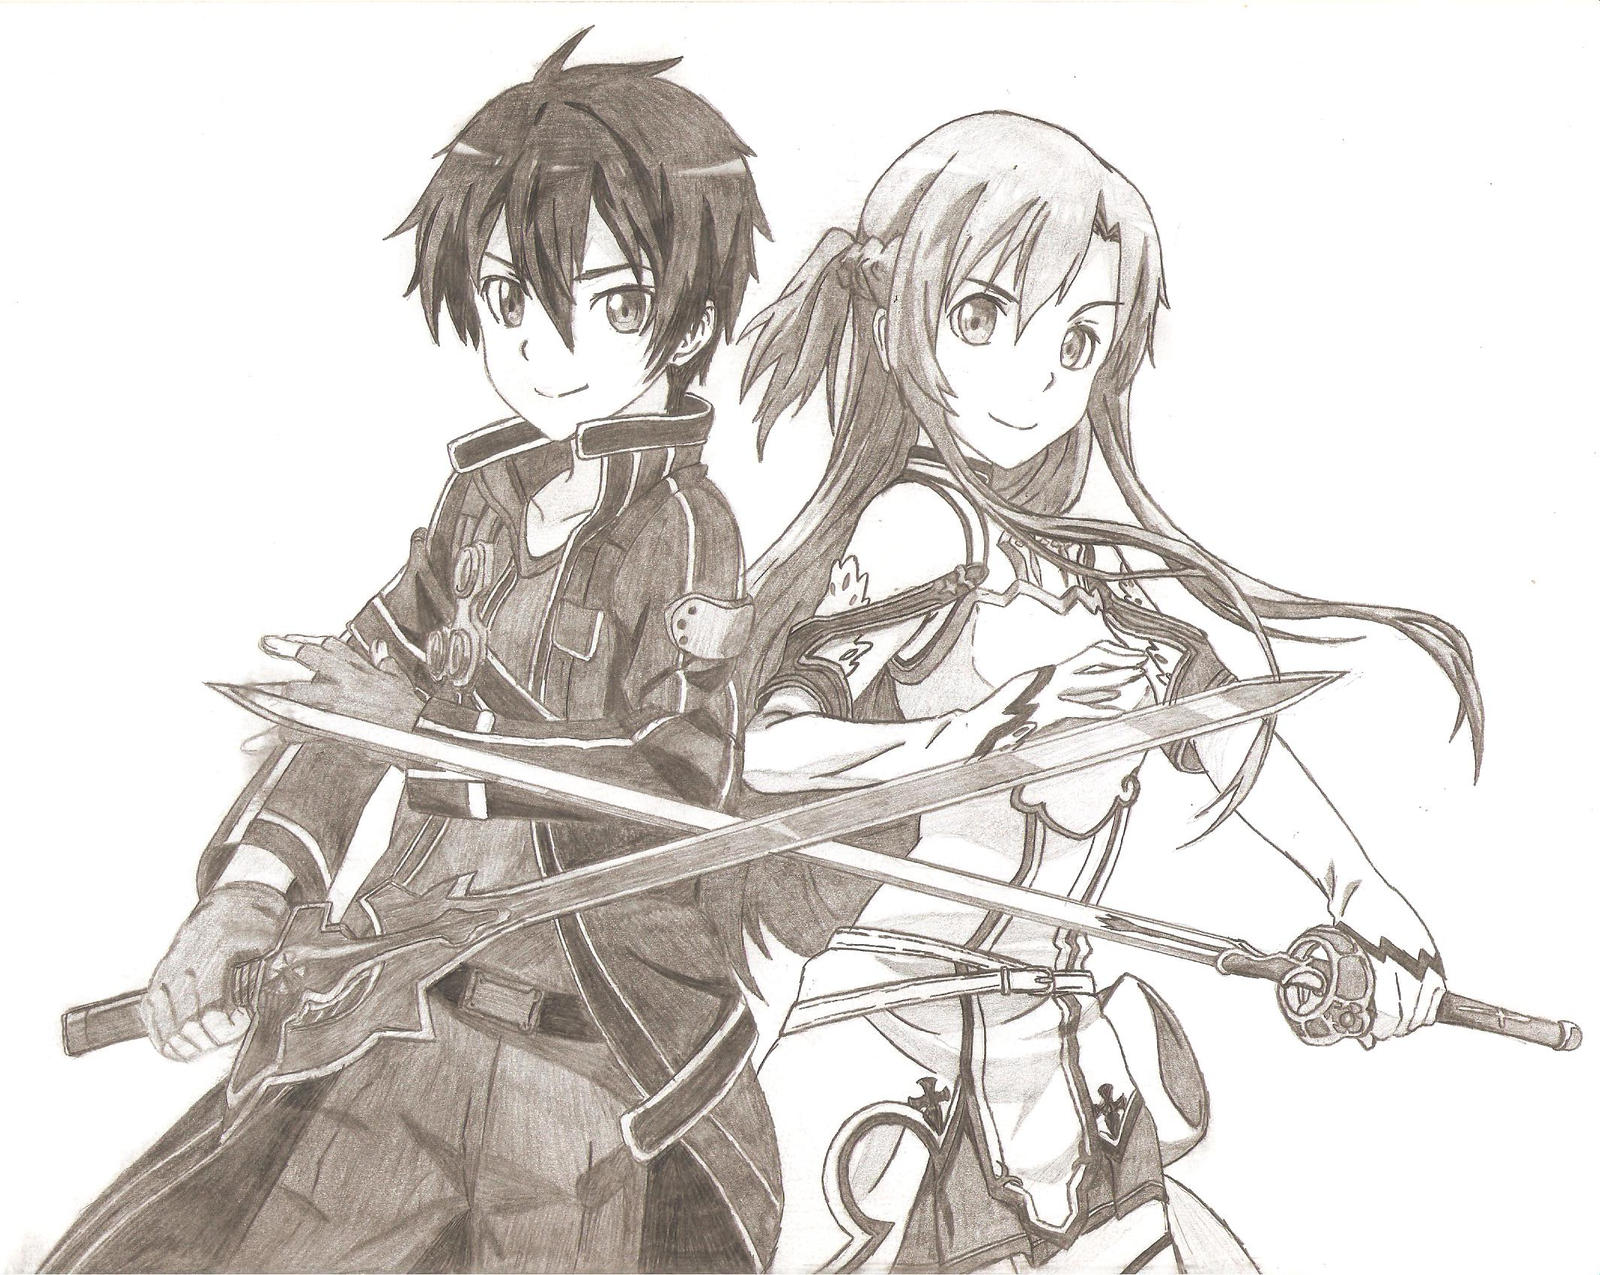 Sword Art Online - Kirito/Asuna By ZeusAFK On DeviantArt